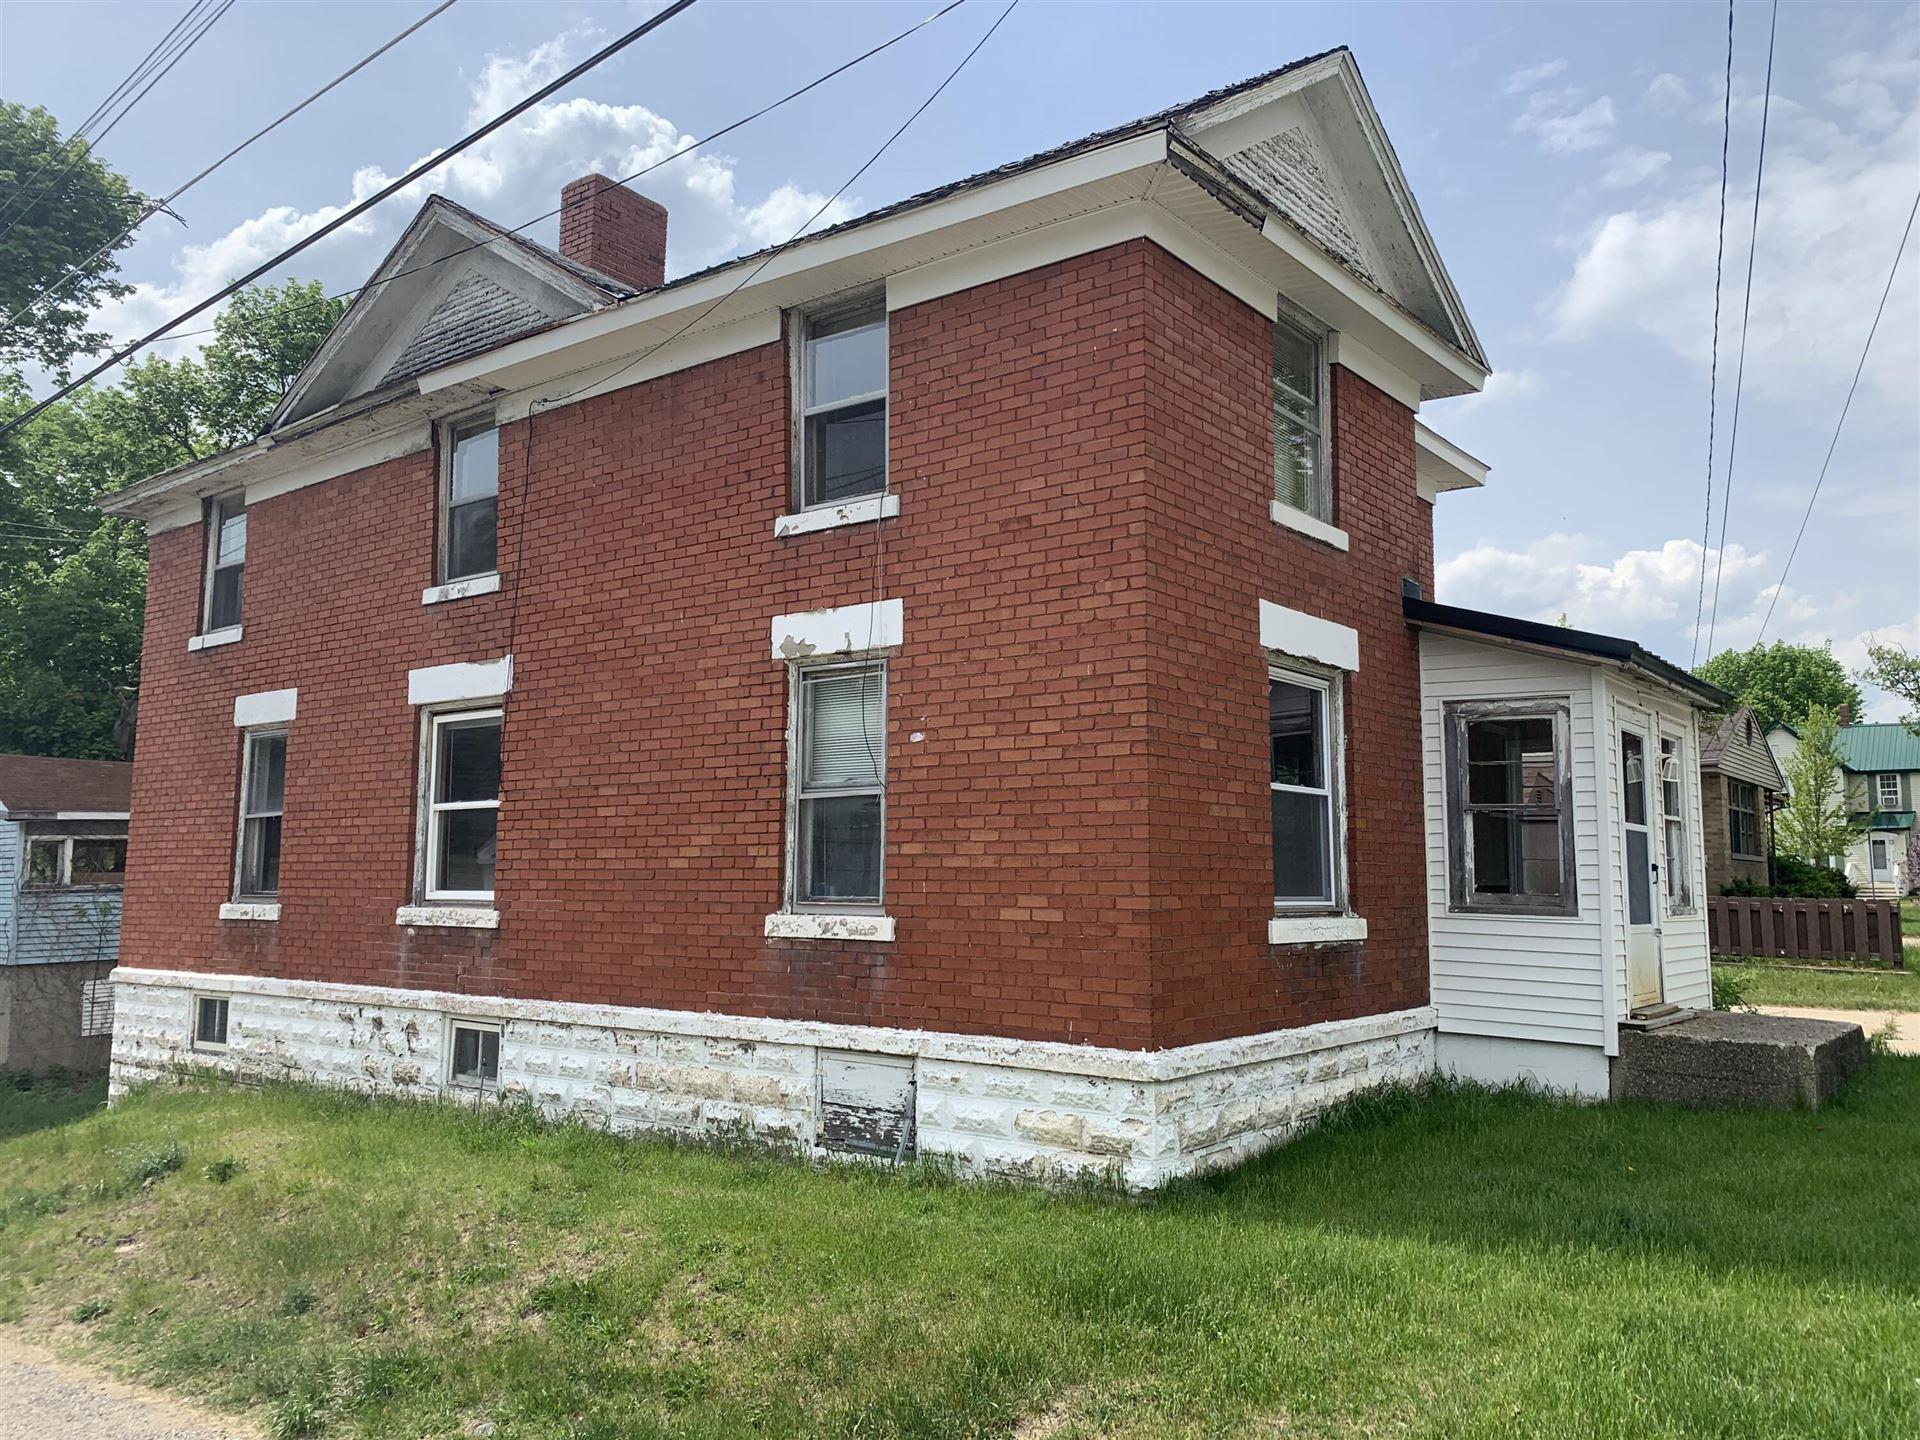 311 & 313 N Simon Street, Cadillac, MI 49601 - MLS#: 21020062